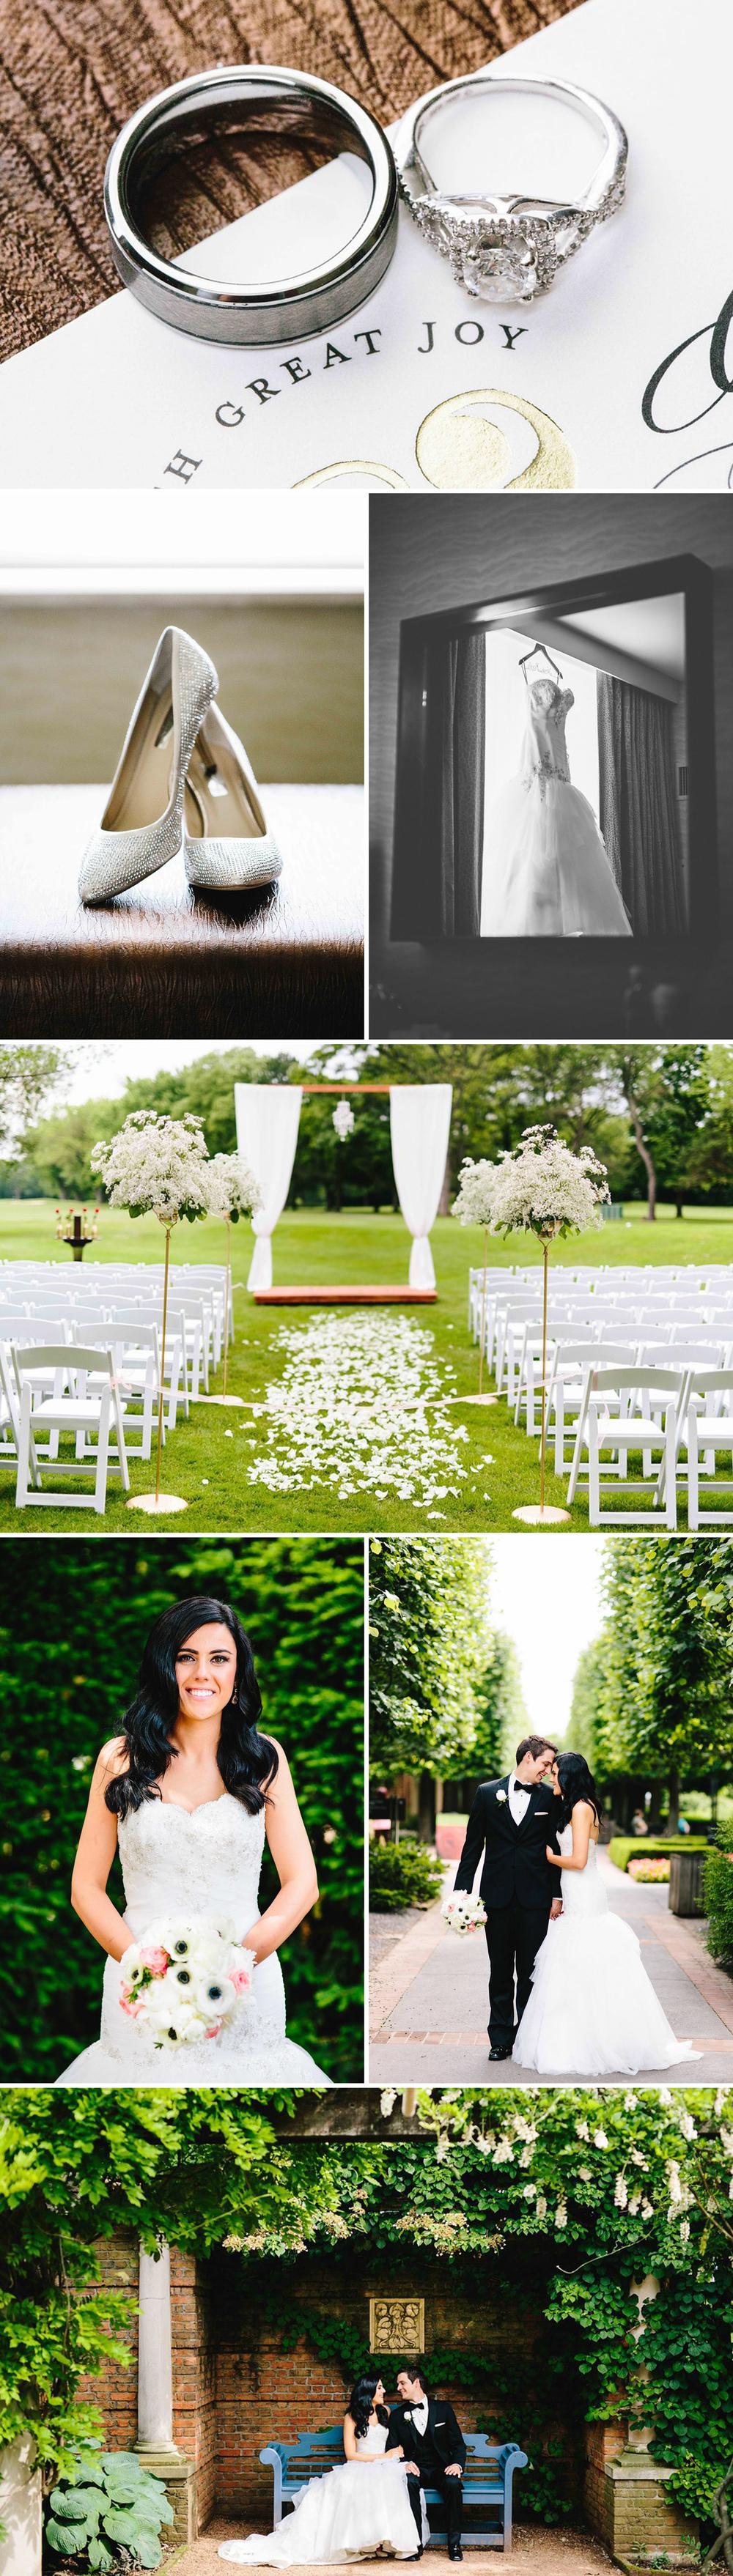 chicago-fine-art-wedding-photography-keele